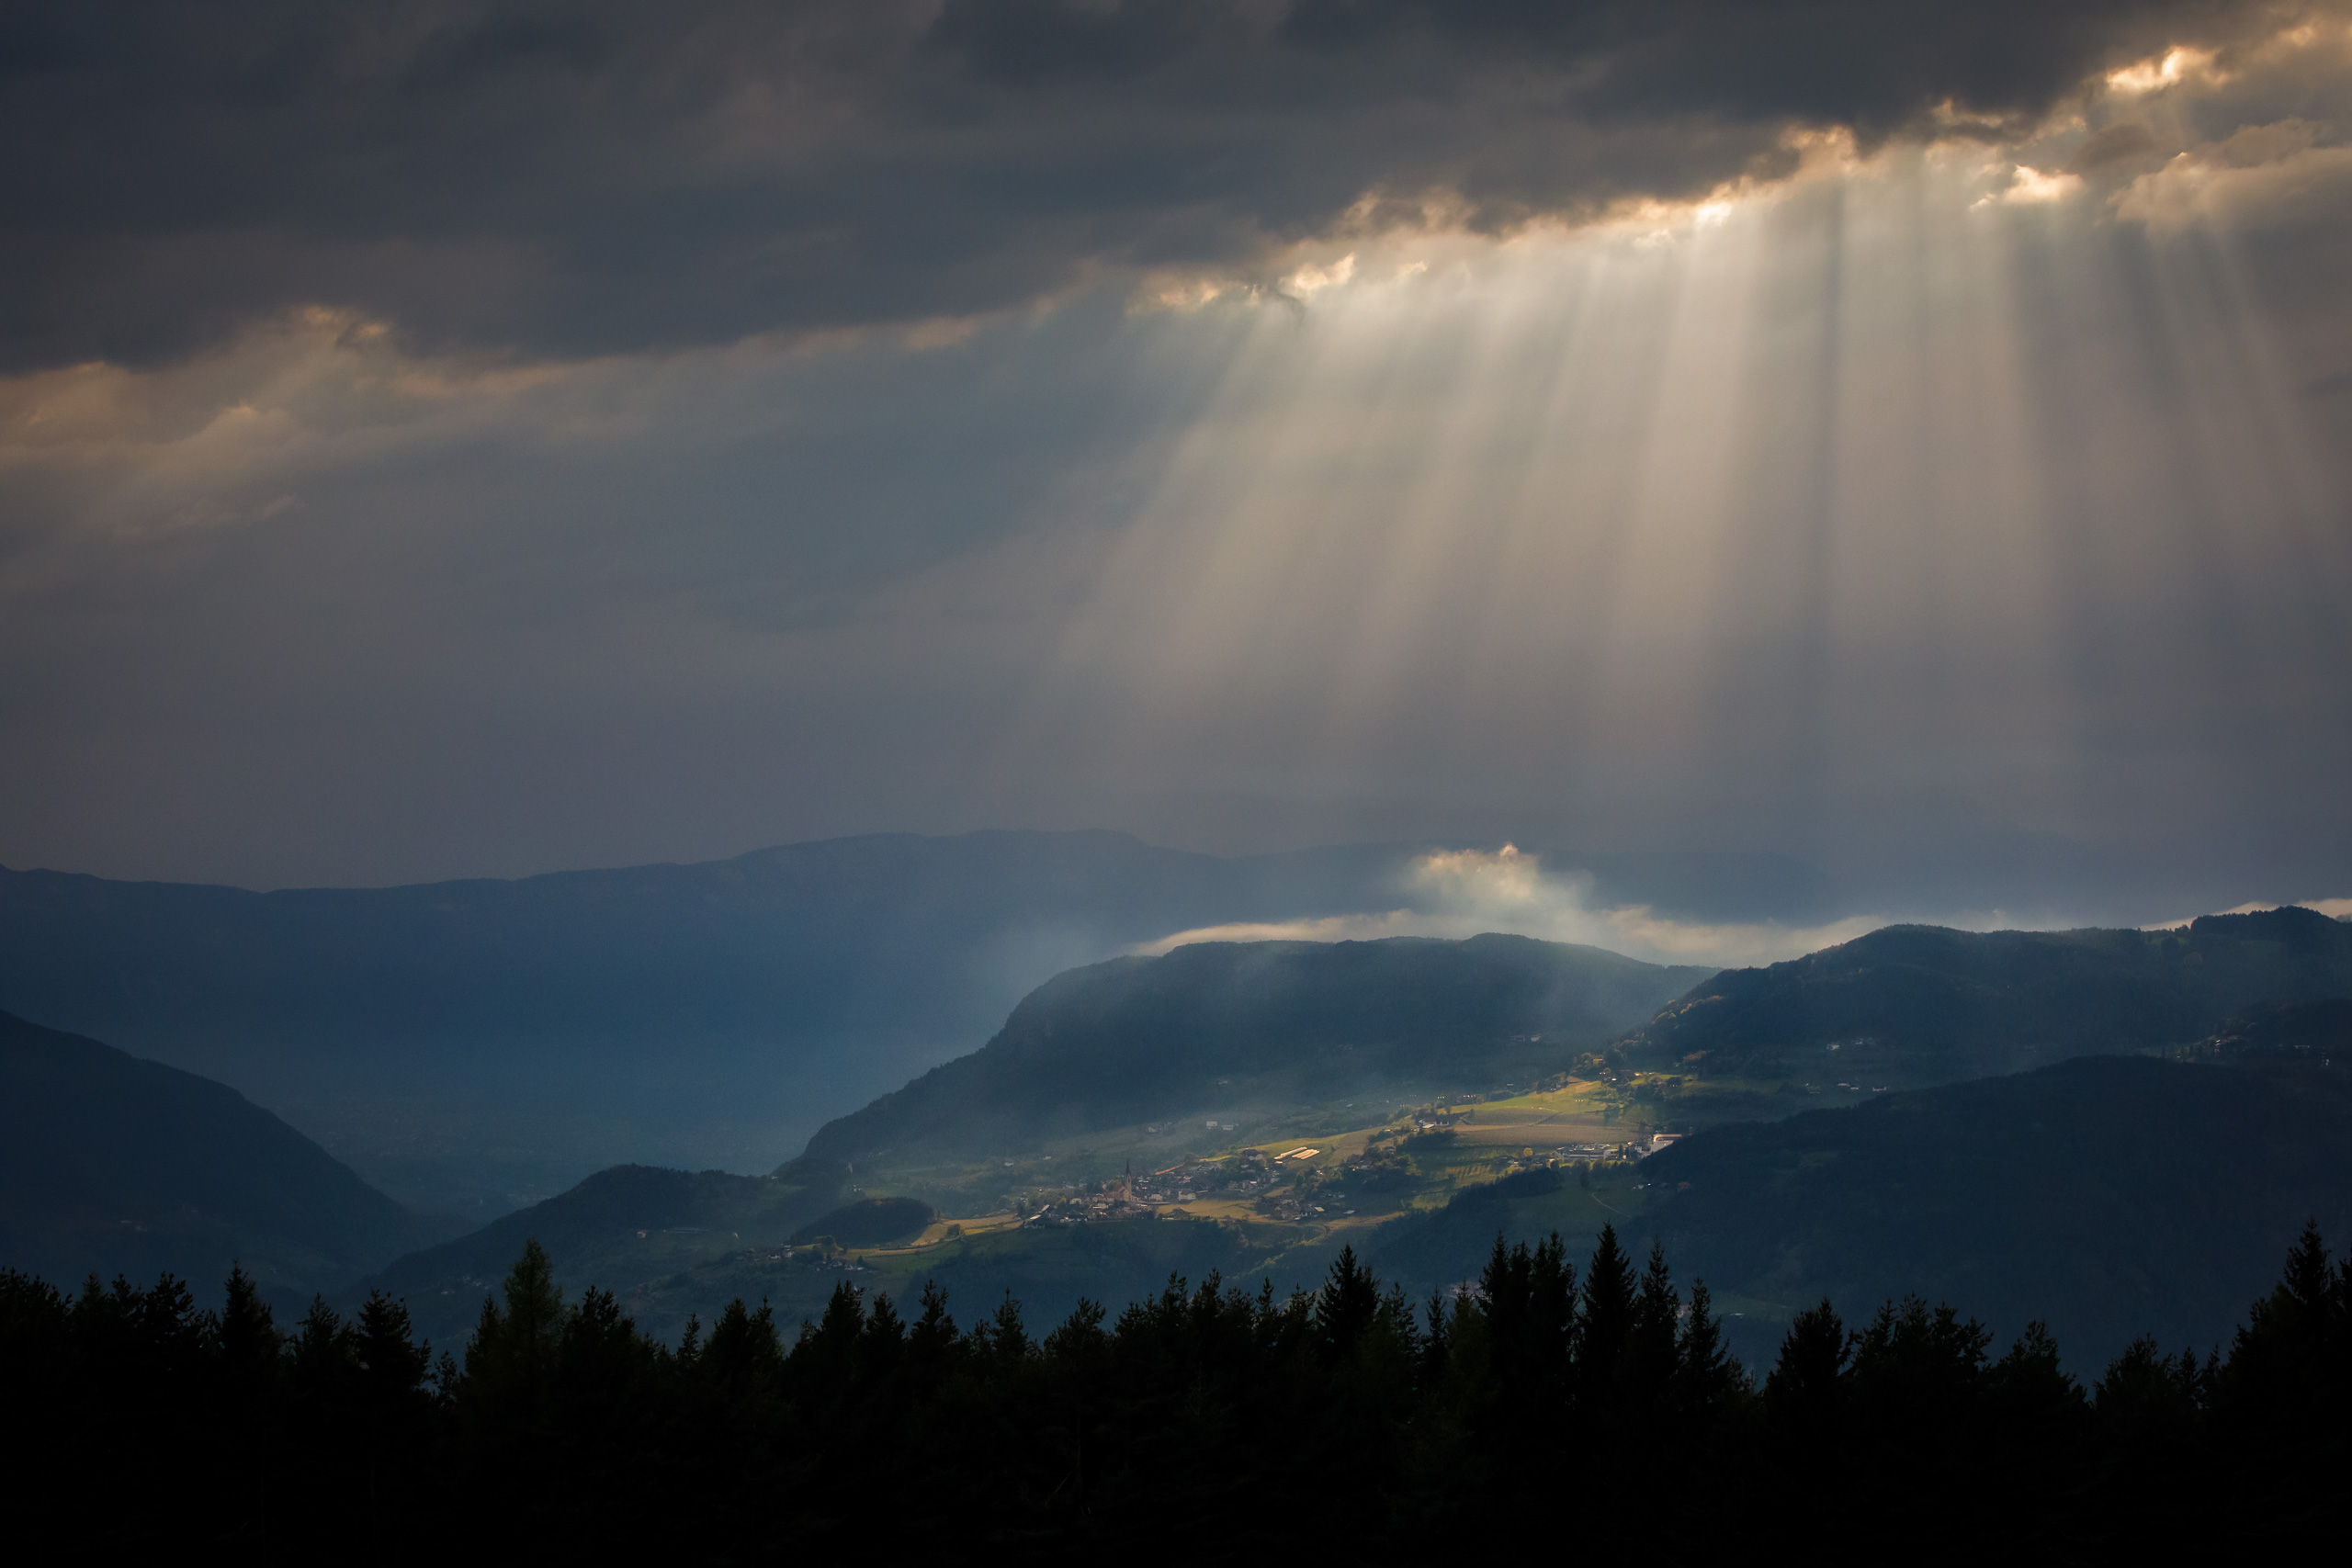 Tom_Schueler_Fotografie_Landschaft_Alpen_Dolomiten_16